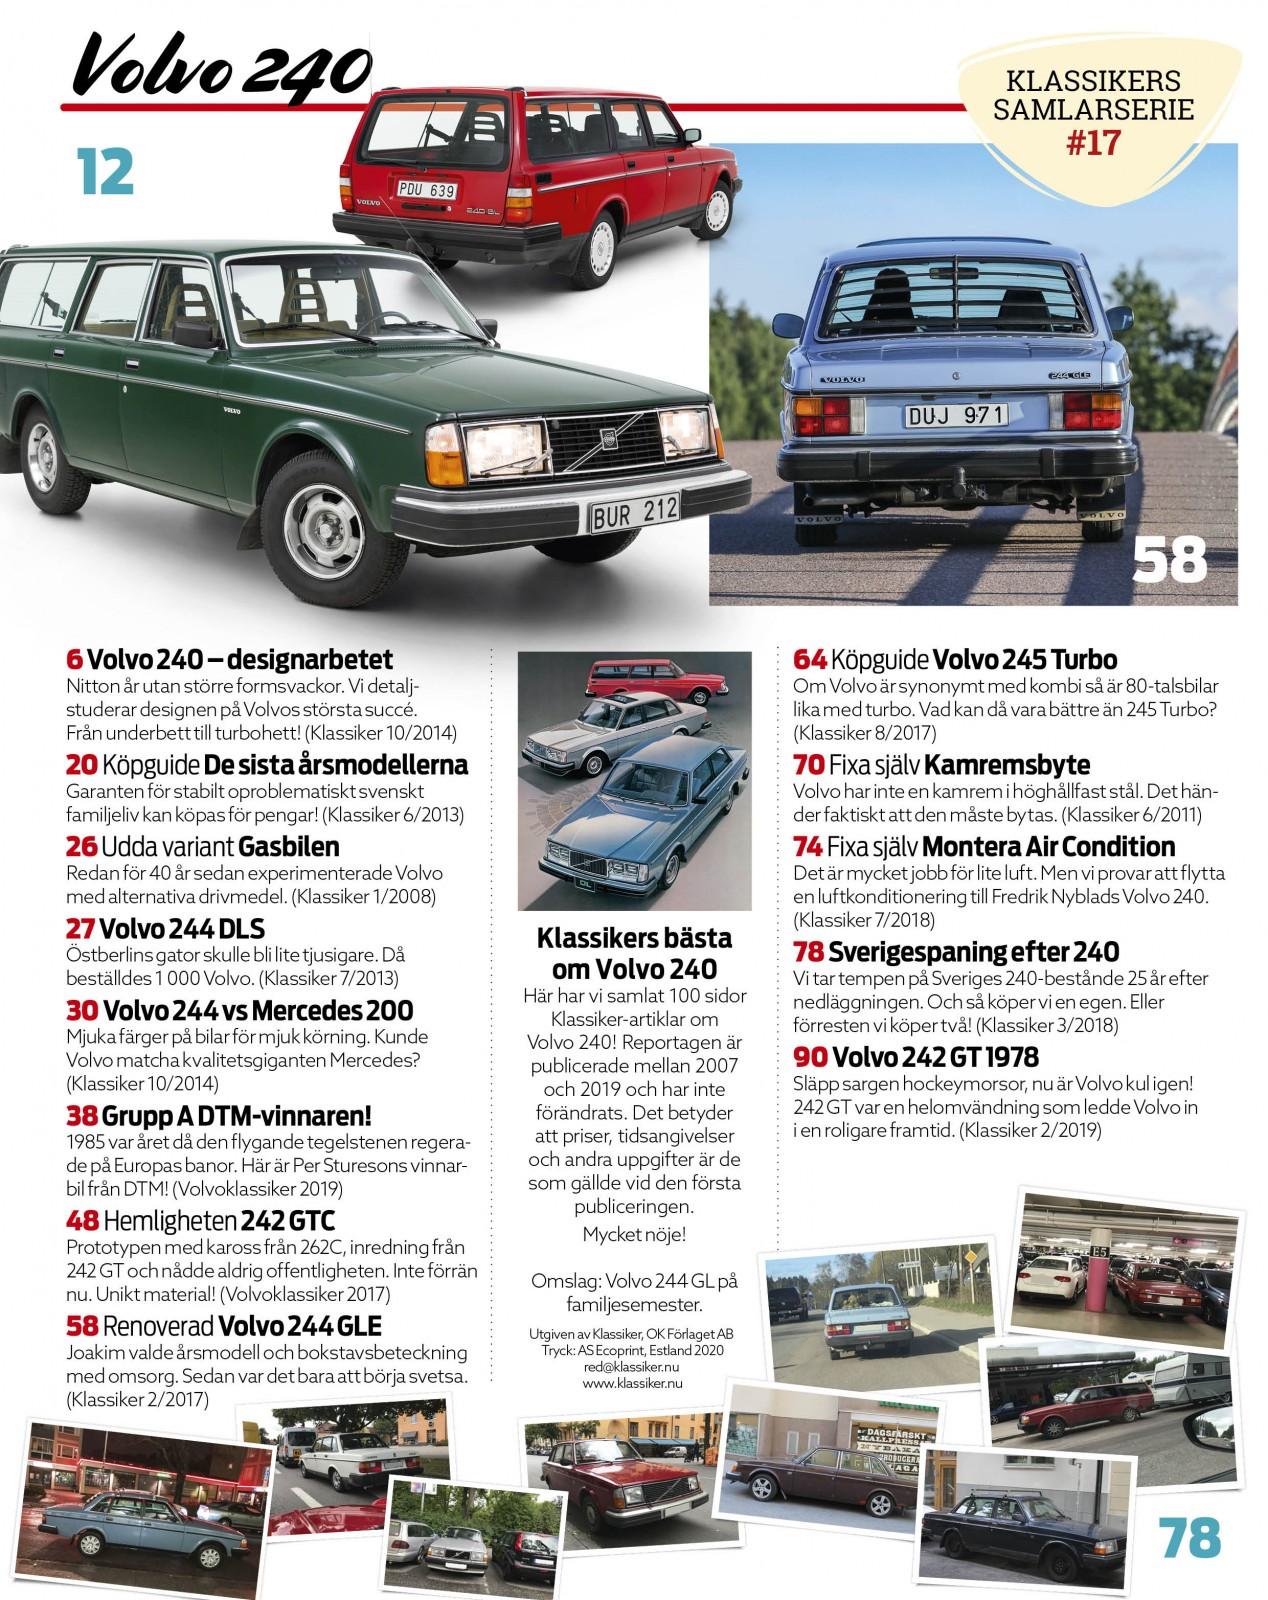 Samlaralbum #17 – Volvo 240